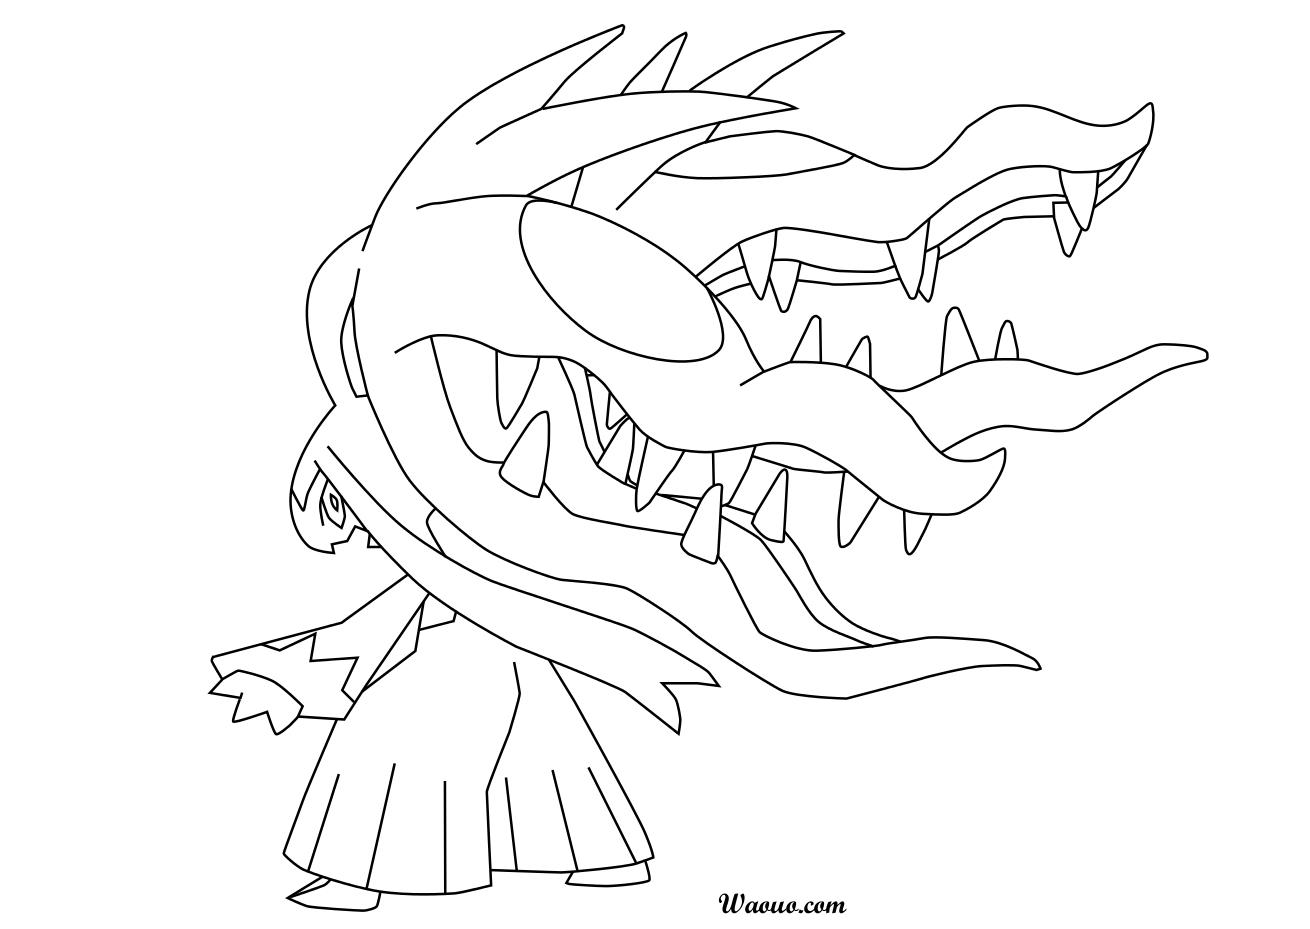 Mysdibule Coloriage Méga Mysdibule Pokemon à Imprimer